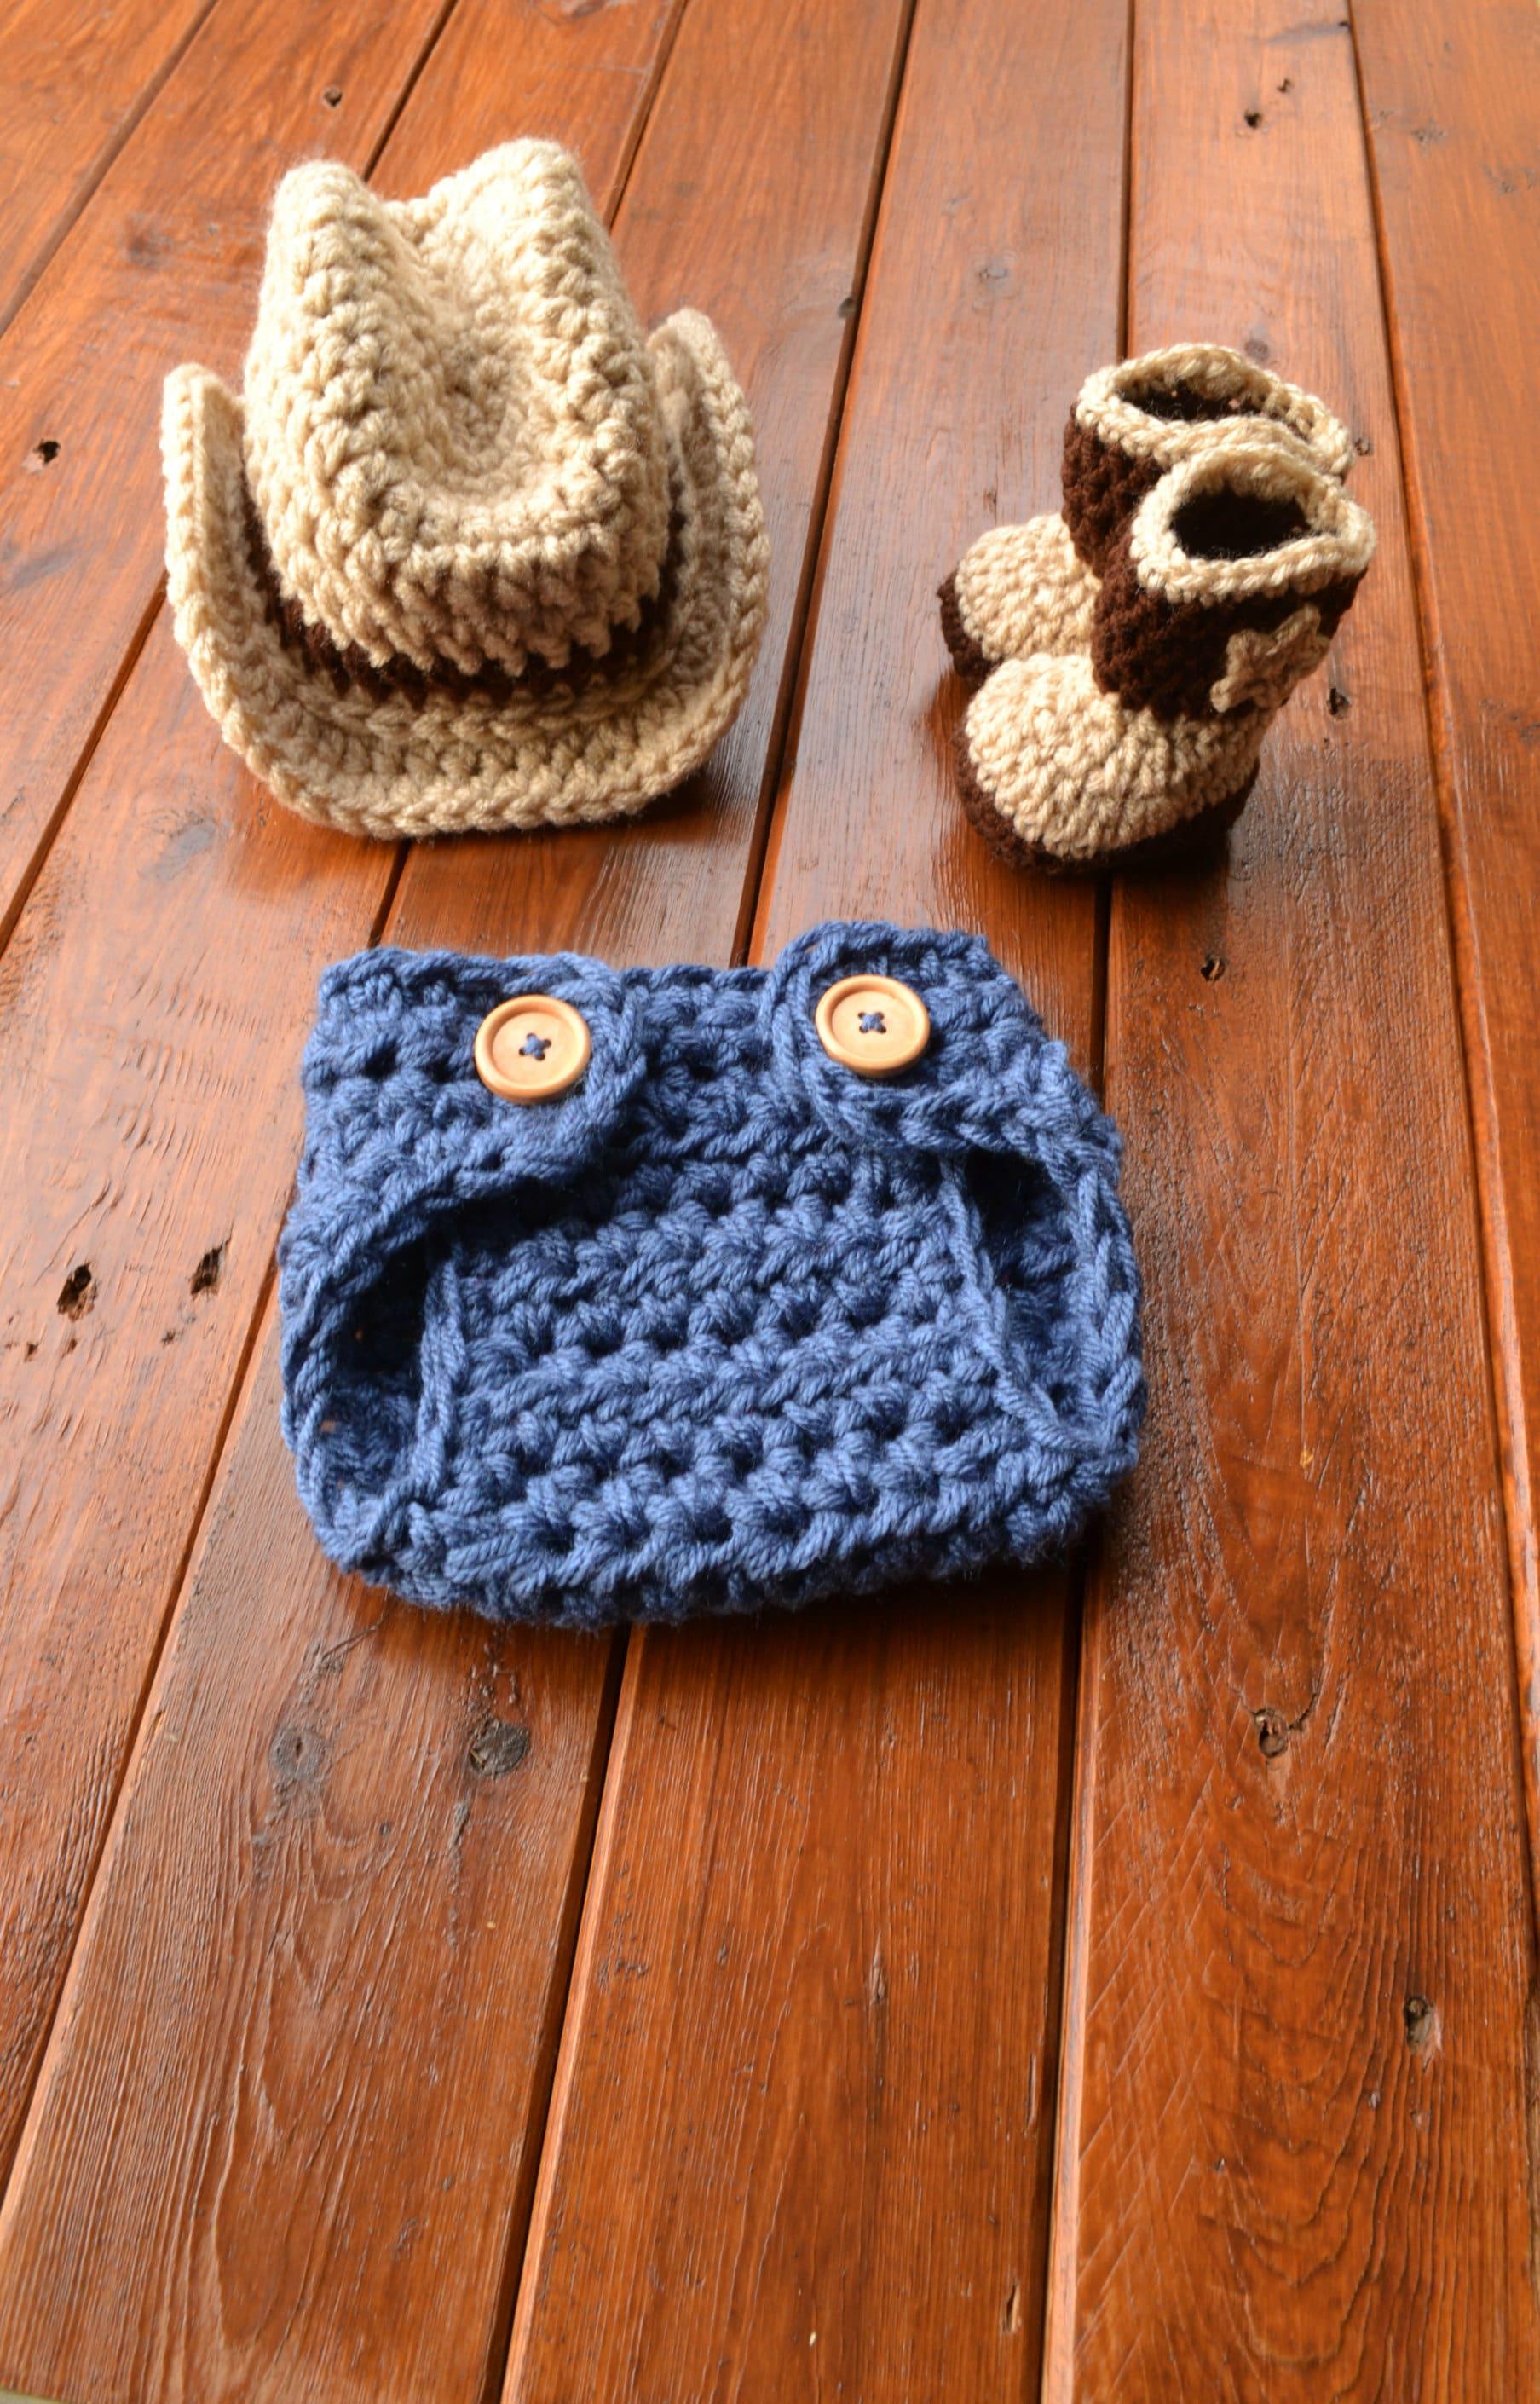 f6b9eb9f0f52b Crochet Baby Cowboy Outfit Cowboy Hat and Boots Set Newborn